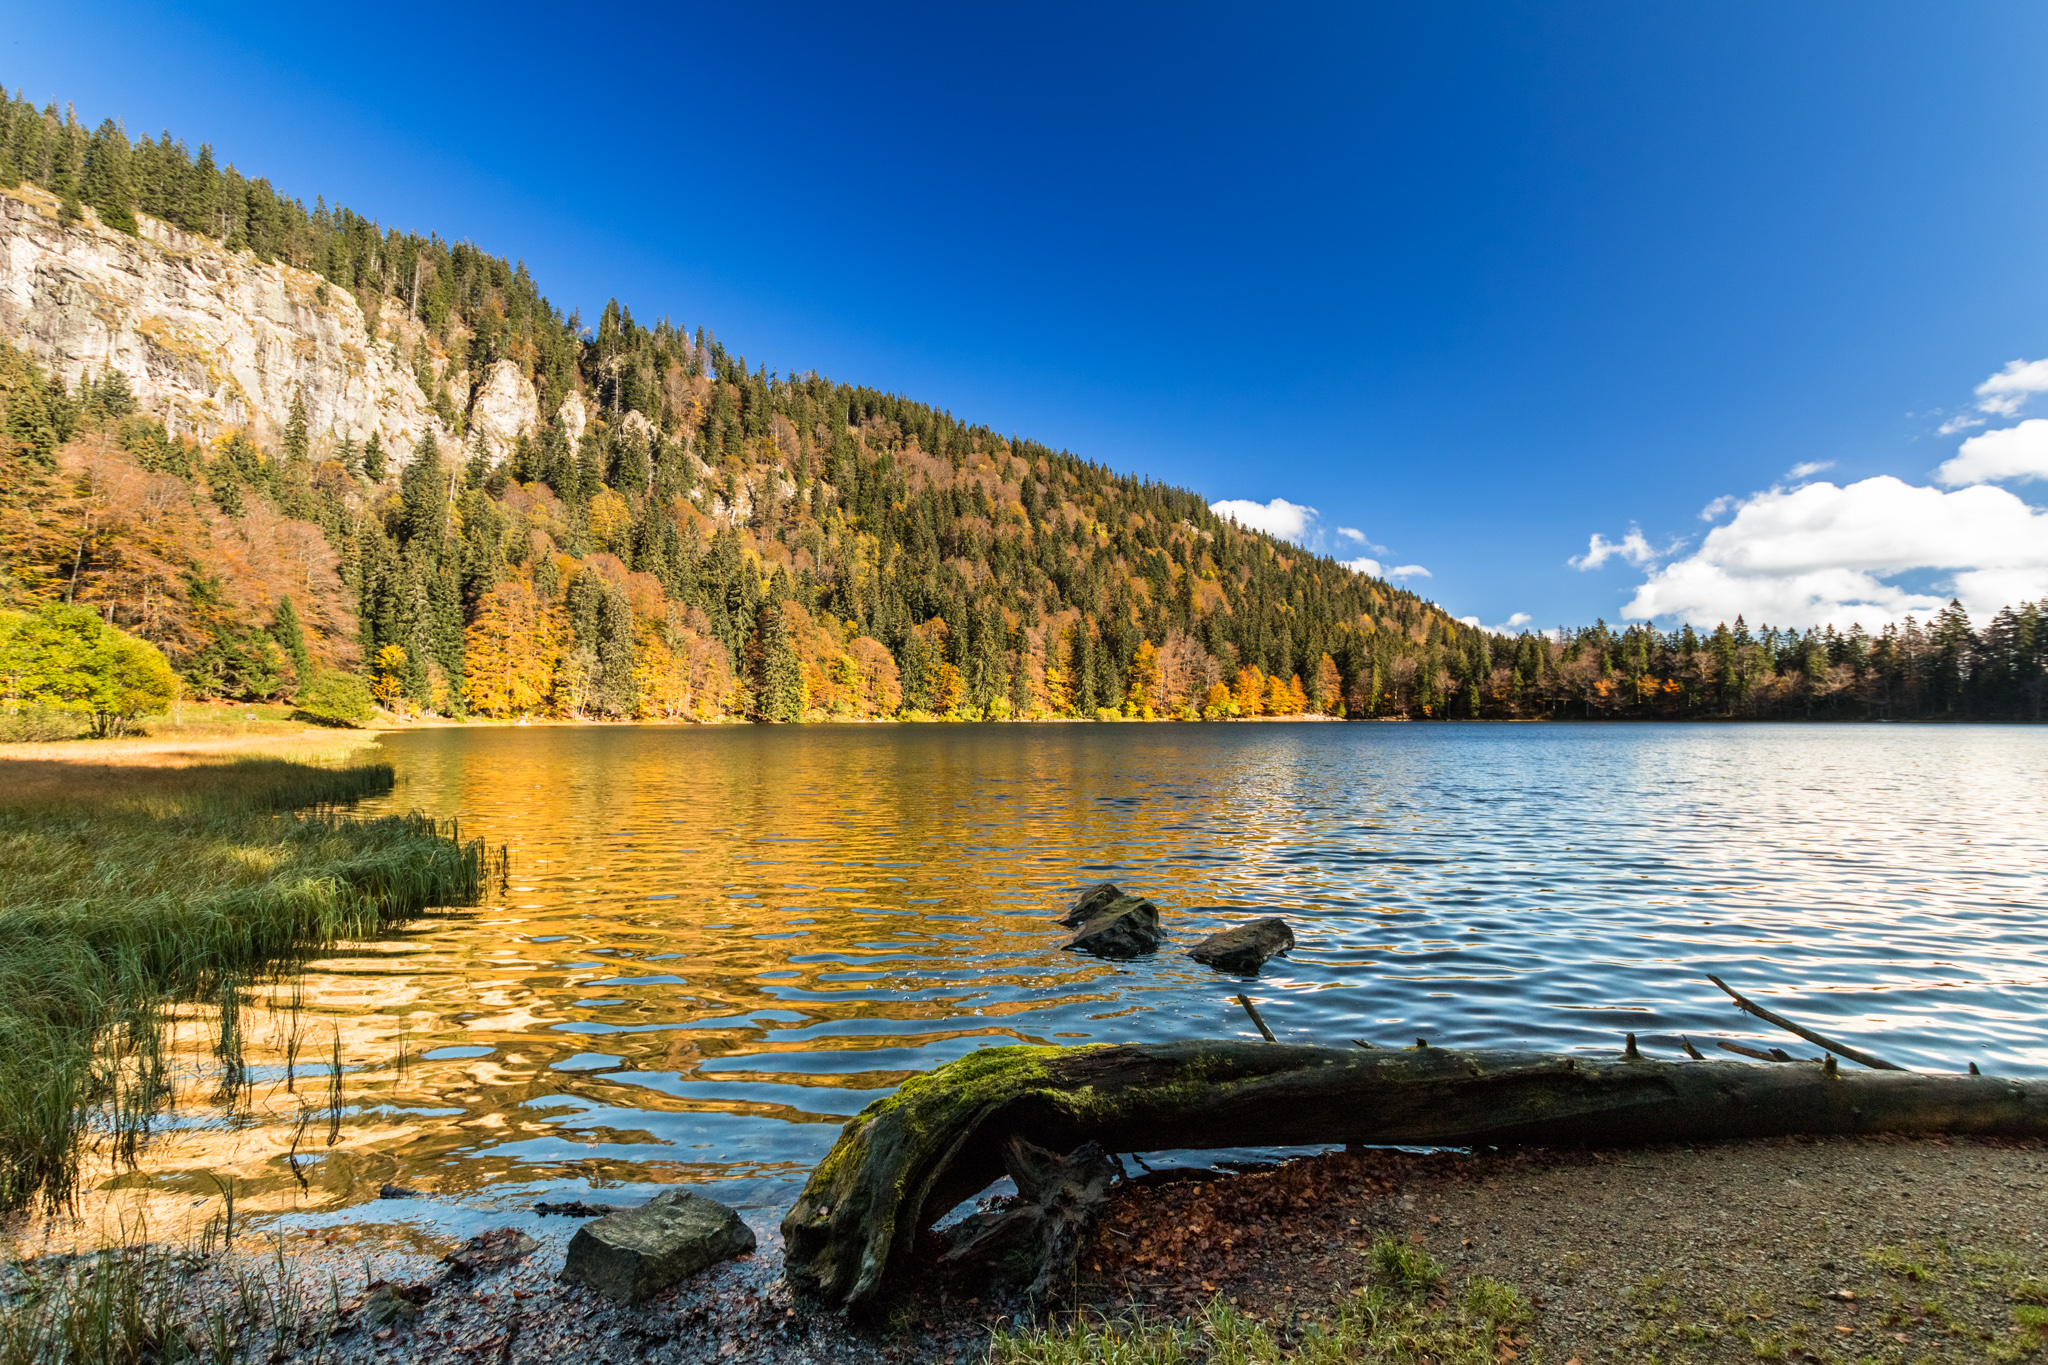 Feldsee, Black Forest, Germany